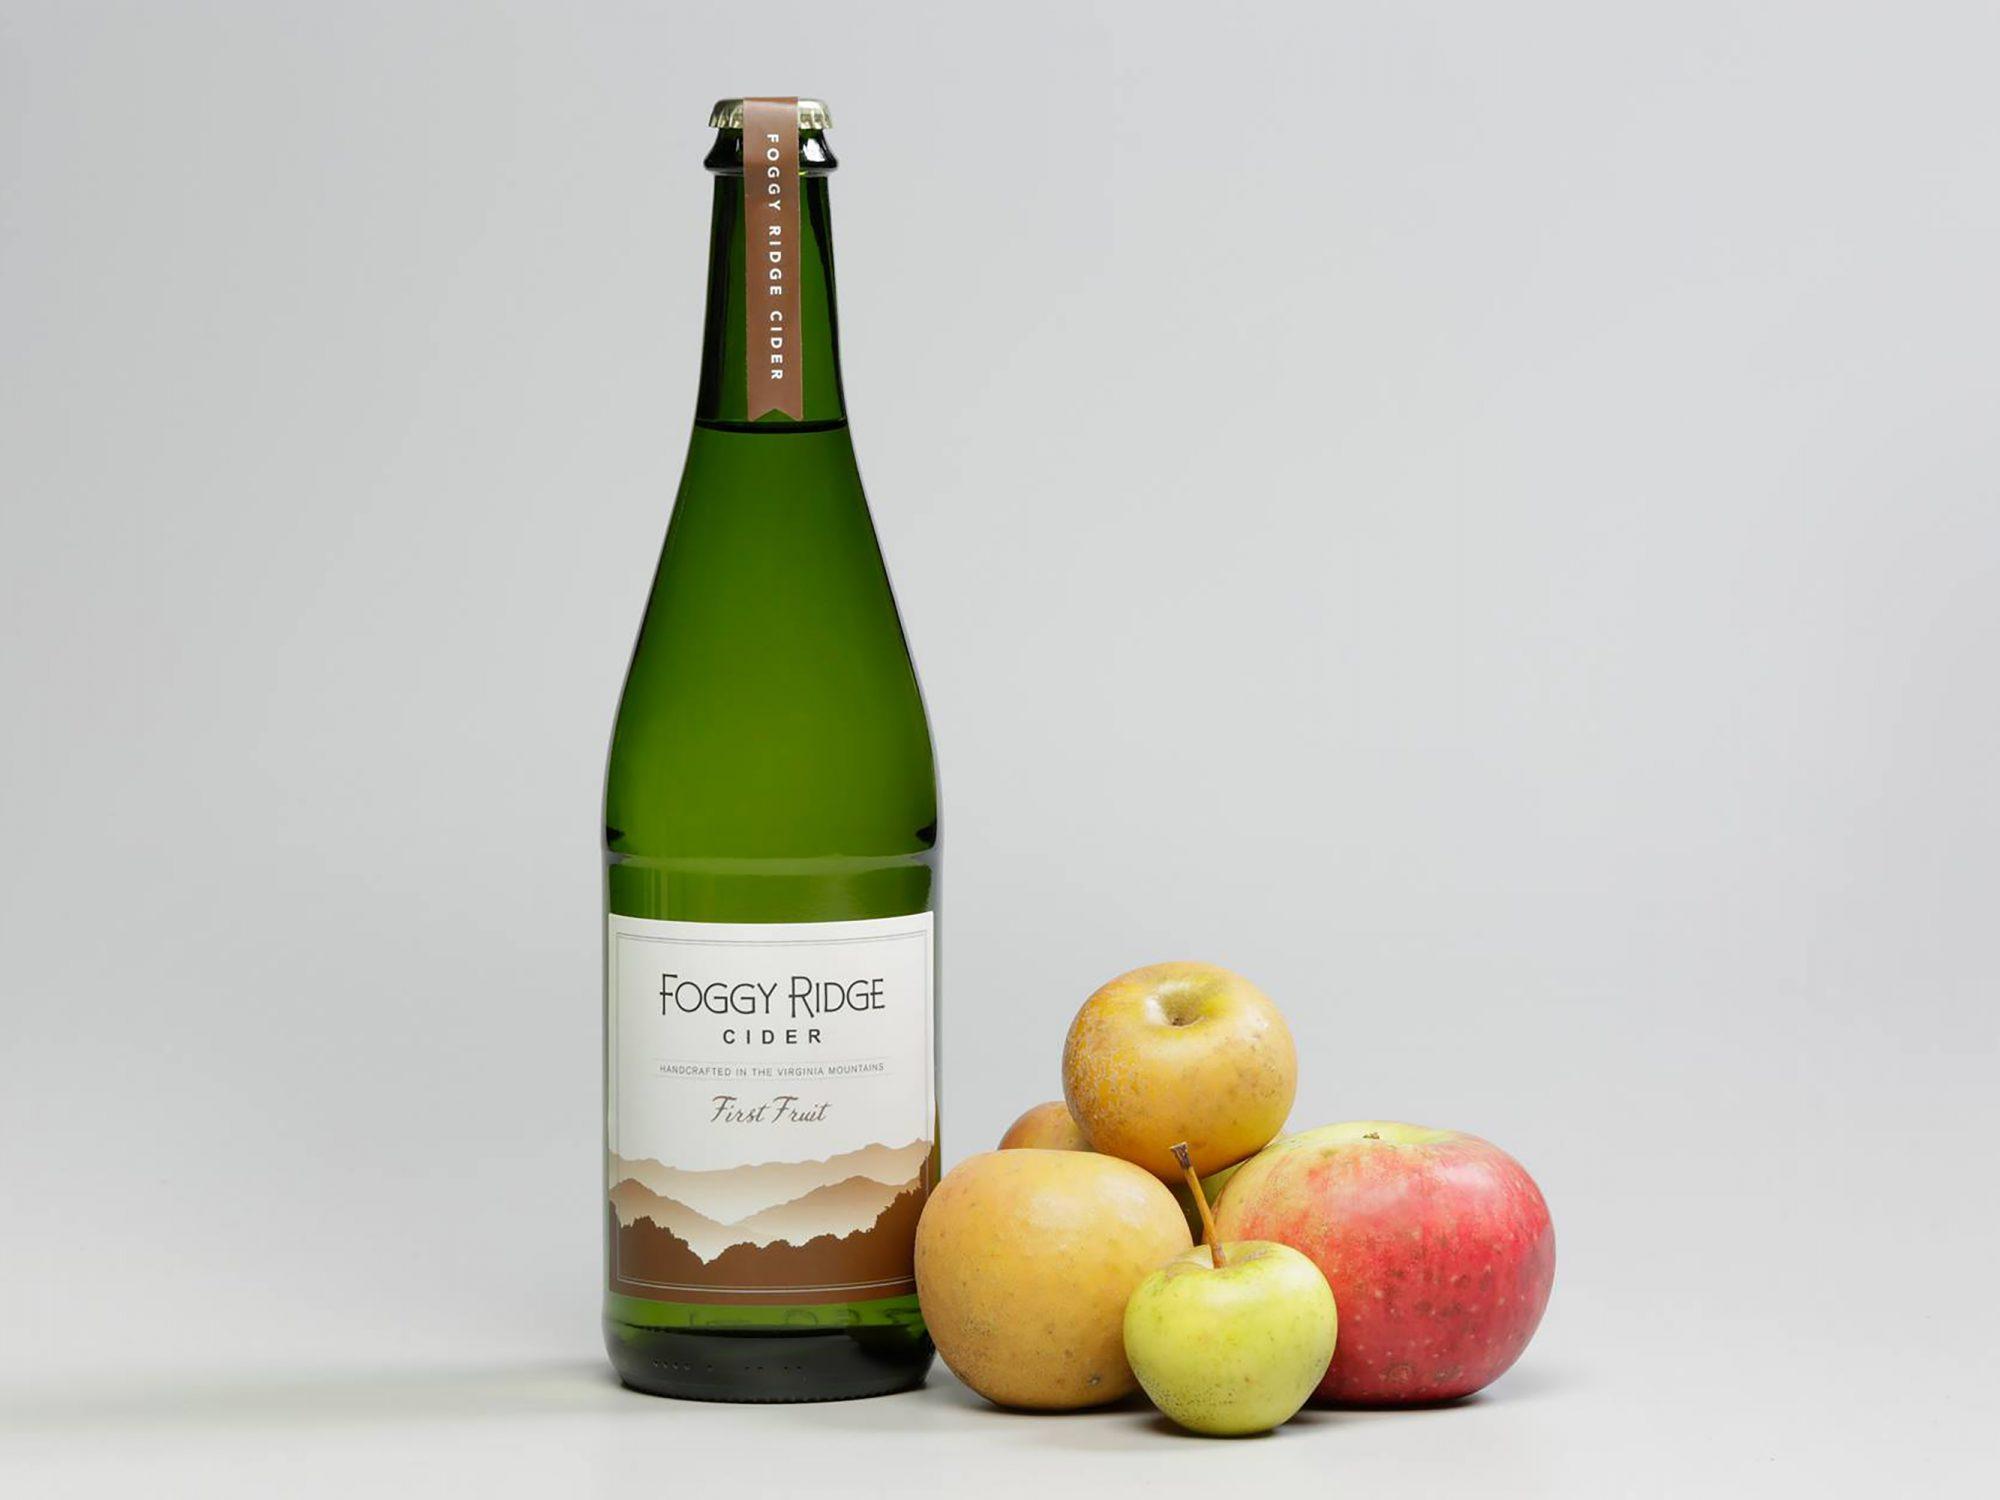 Foggy Ridge Cider First Fruit